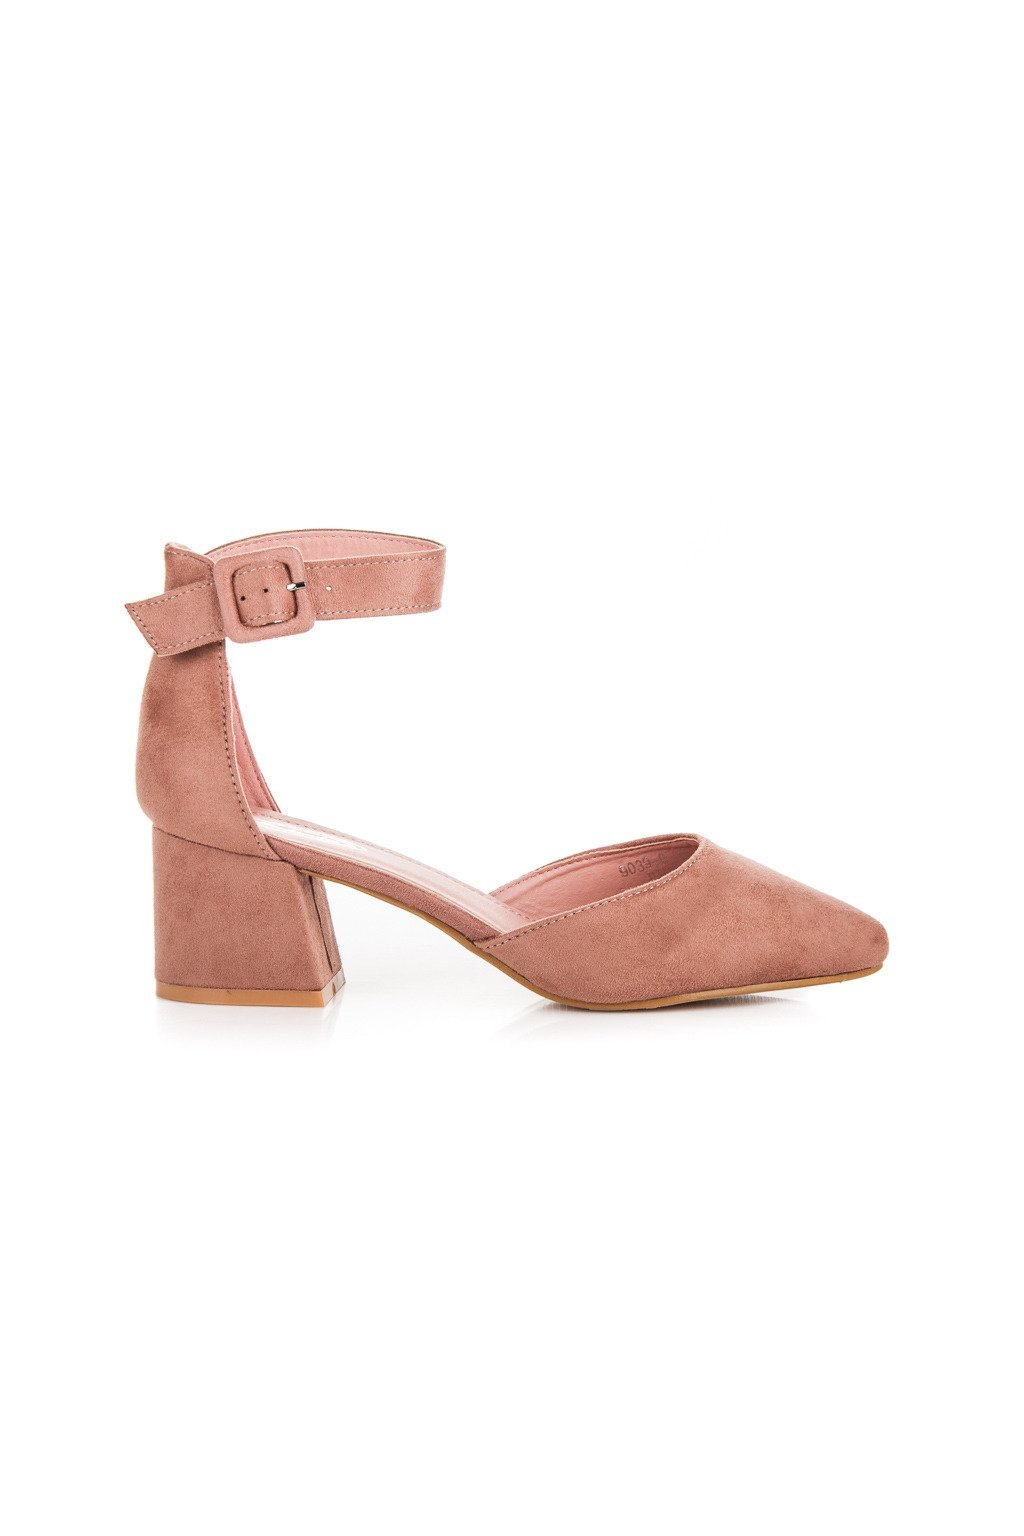 Ružové semišové sandále na nízkom podpätku 9039-9P